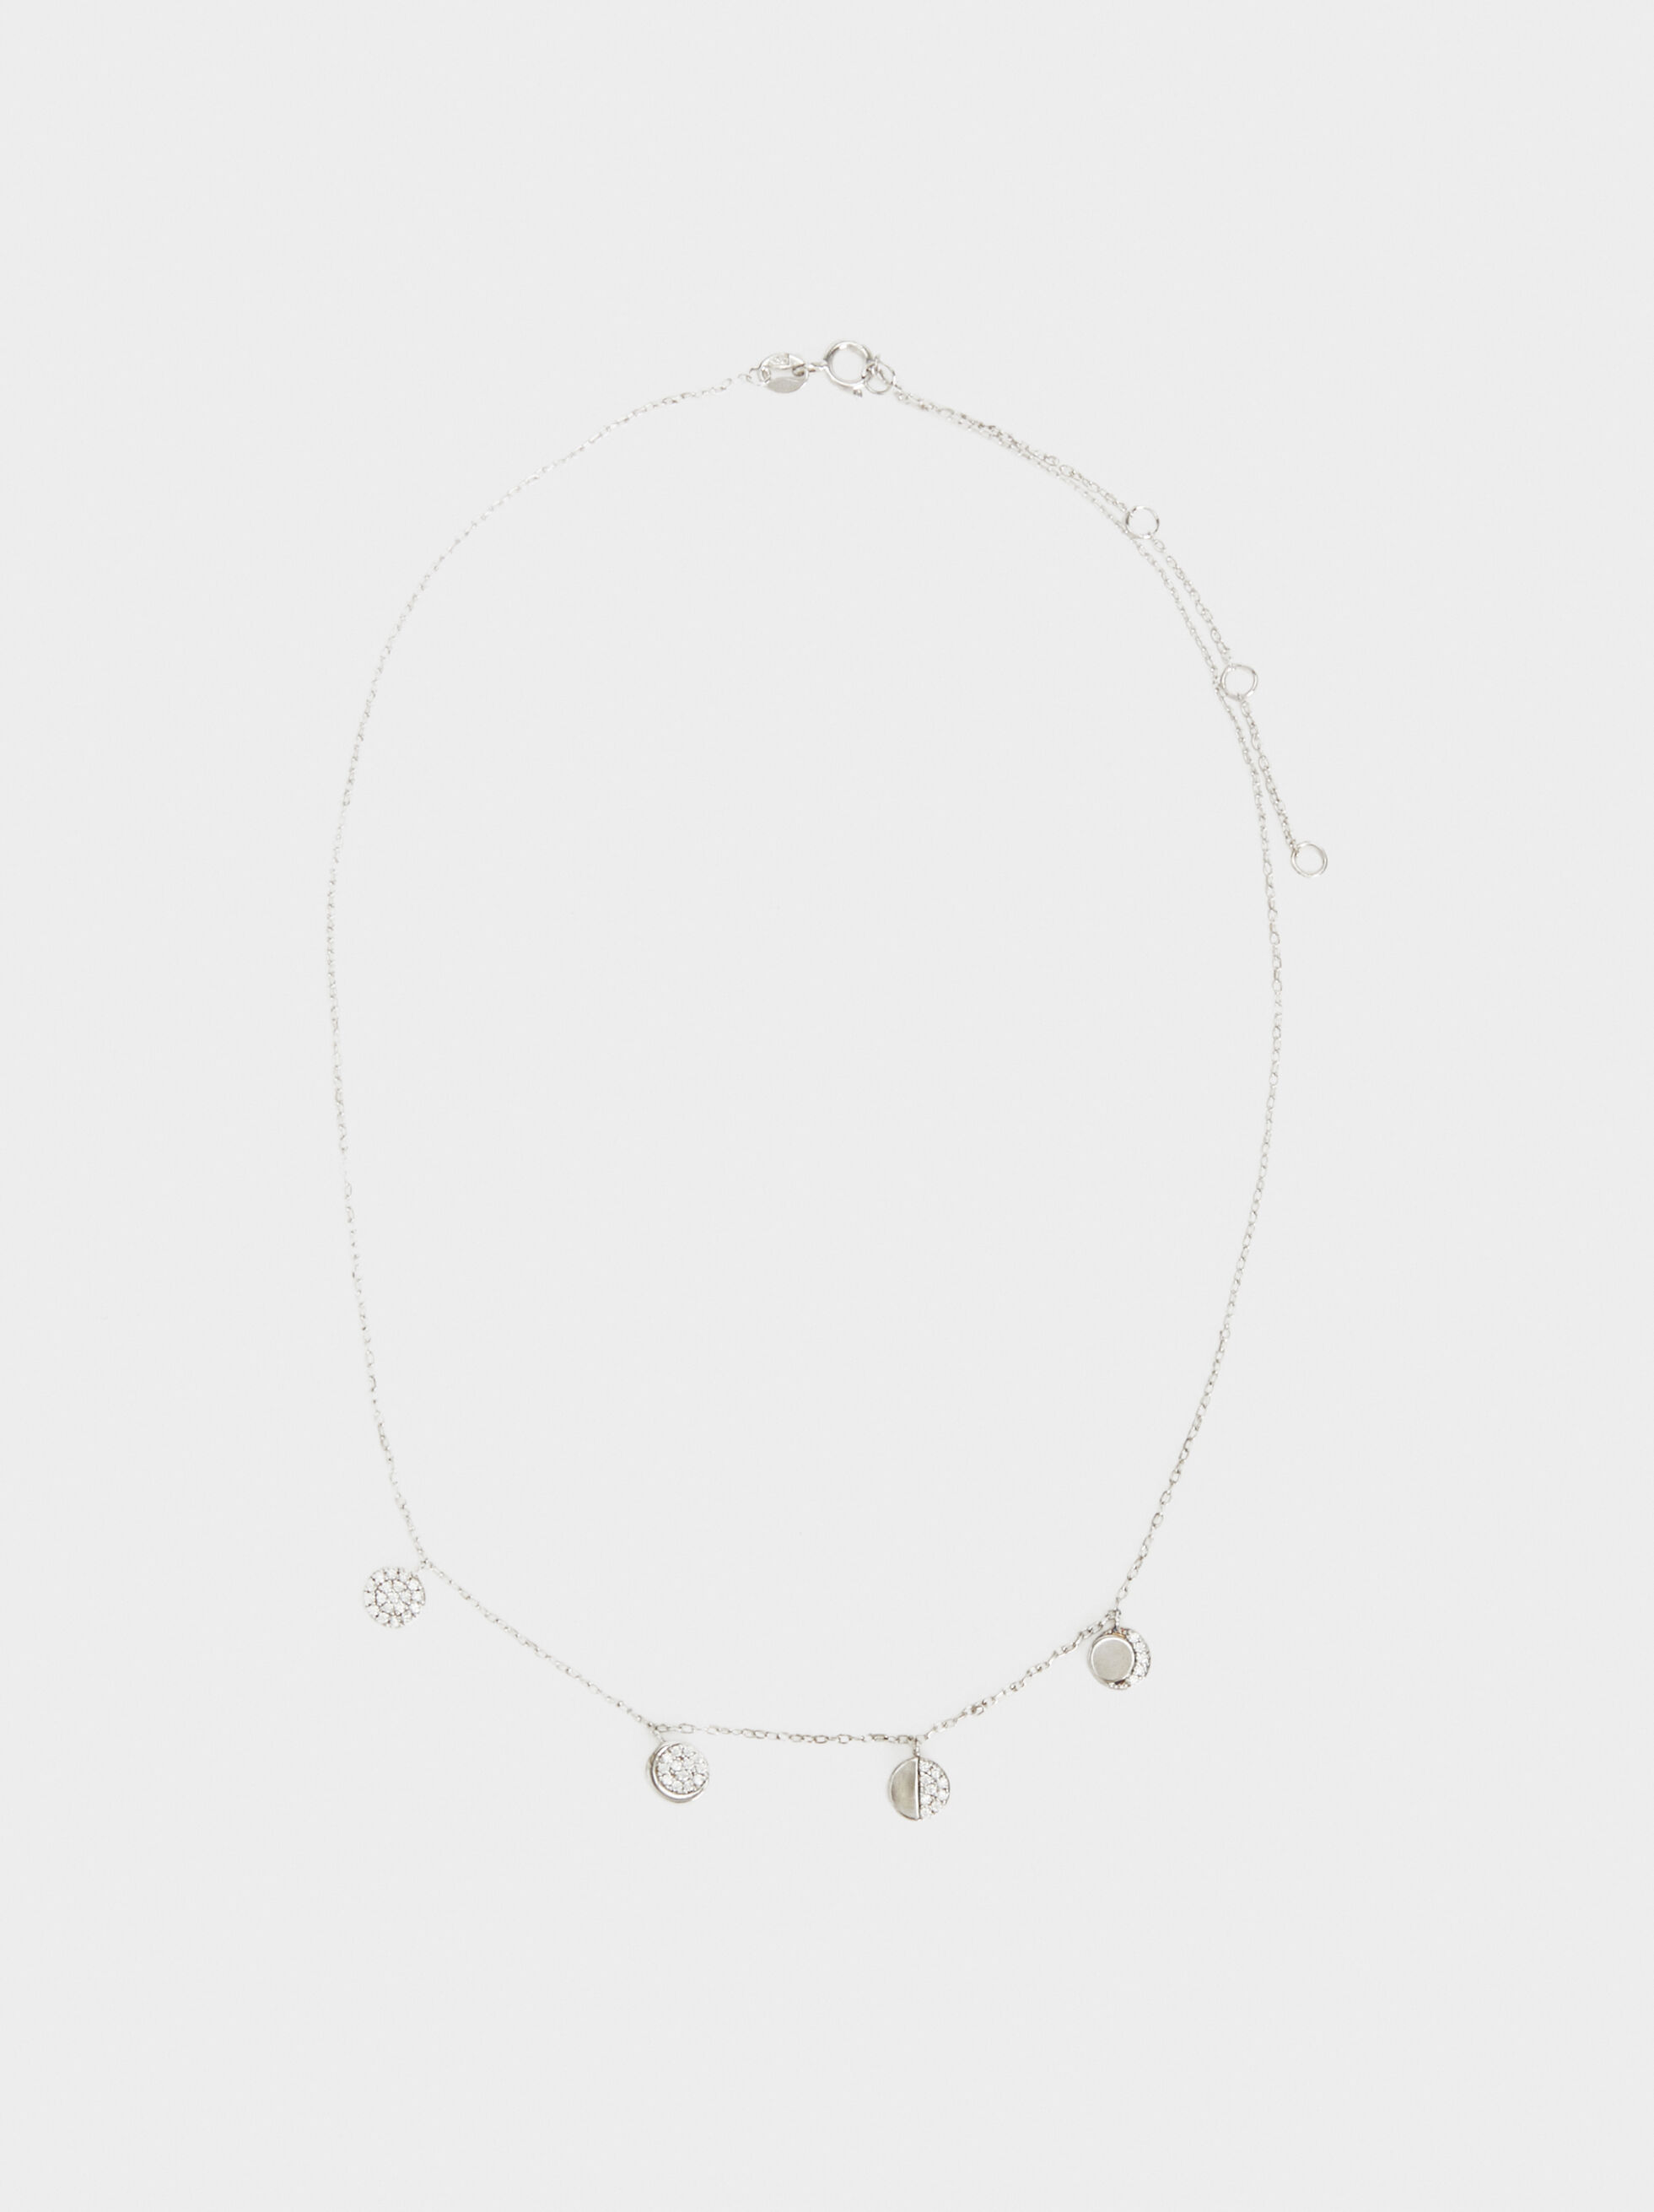 Short 925 Silver Necklace With Moon Pendants, Silver, hi-res